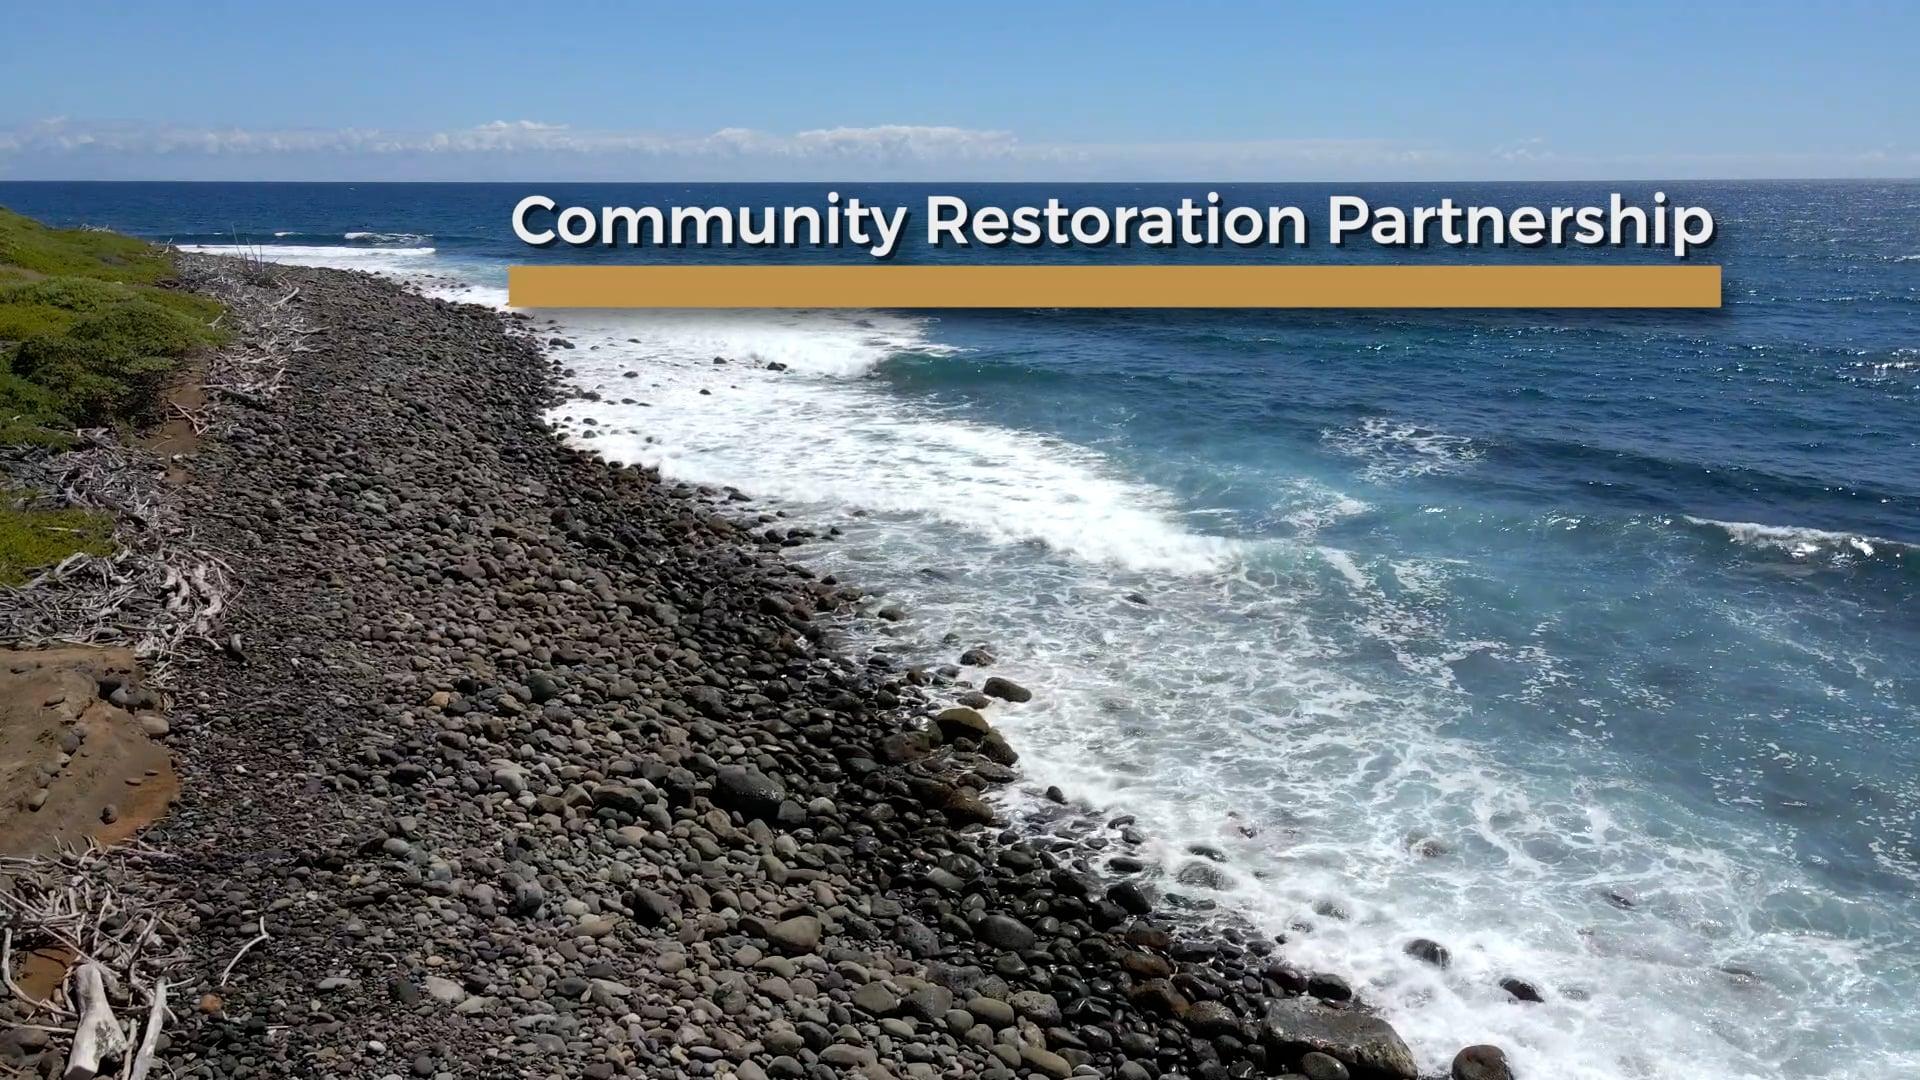 Community Restoration Partnership of Hawai'i Community Foundation